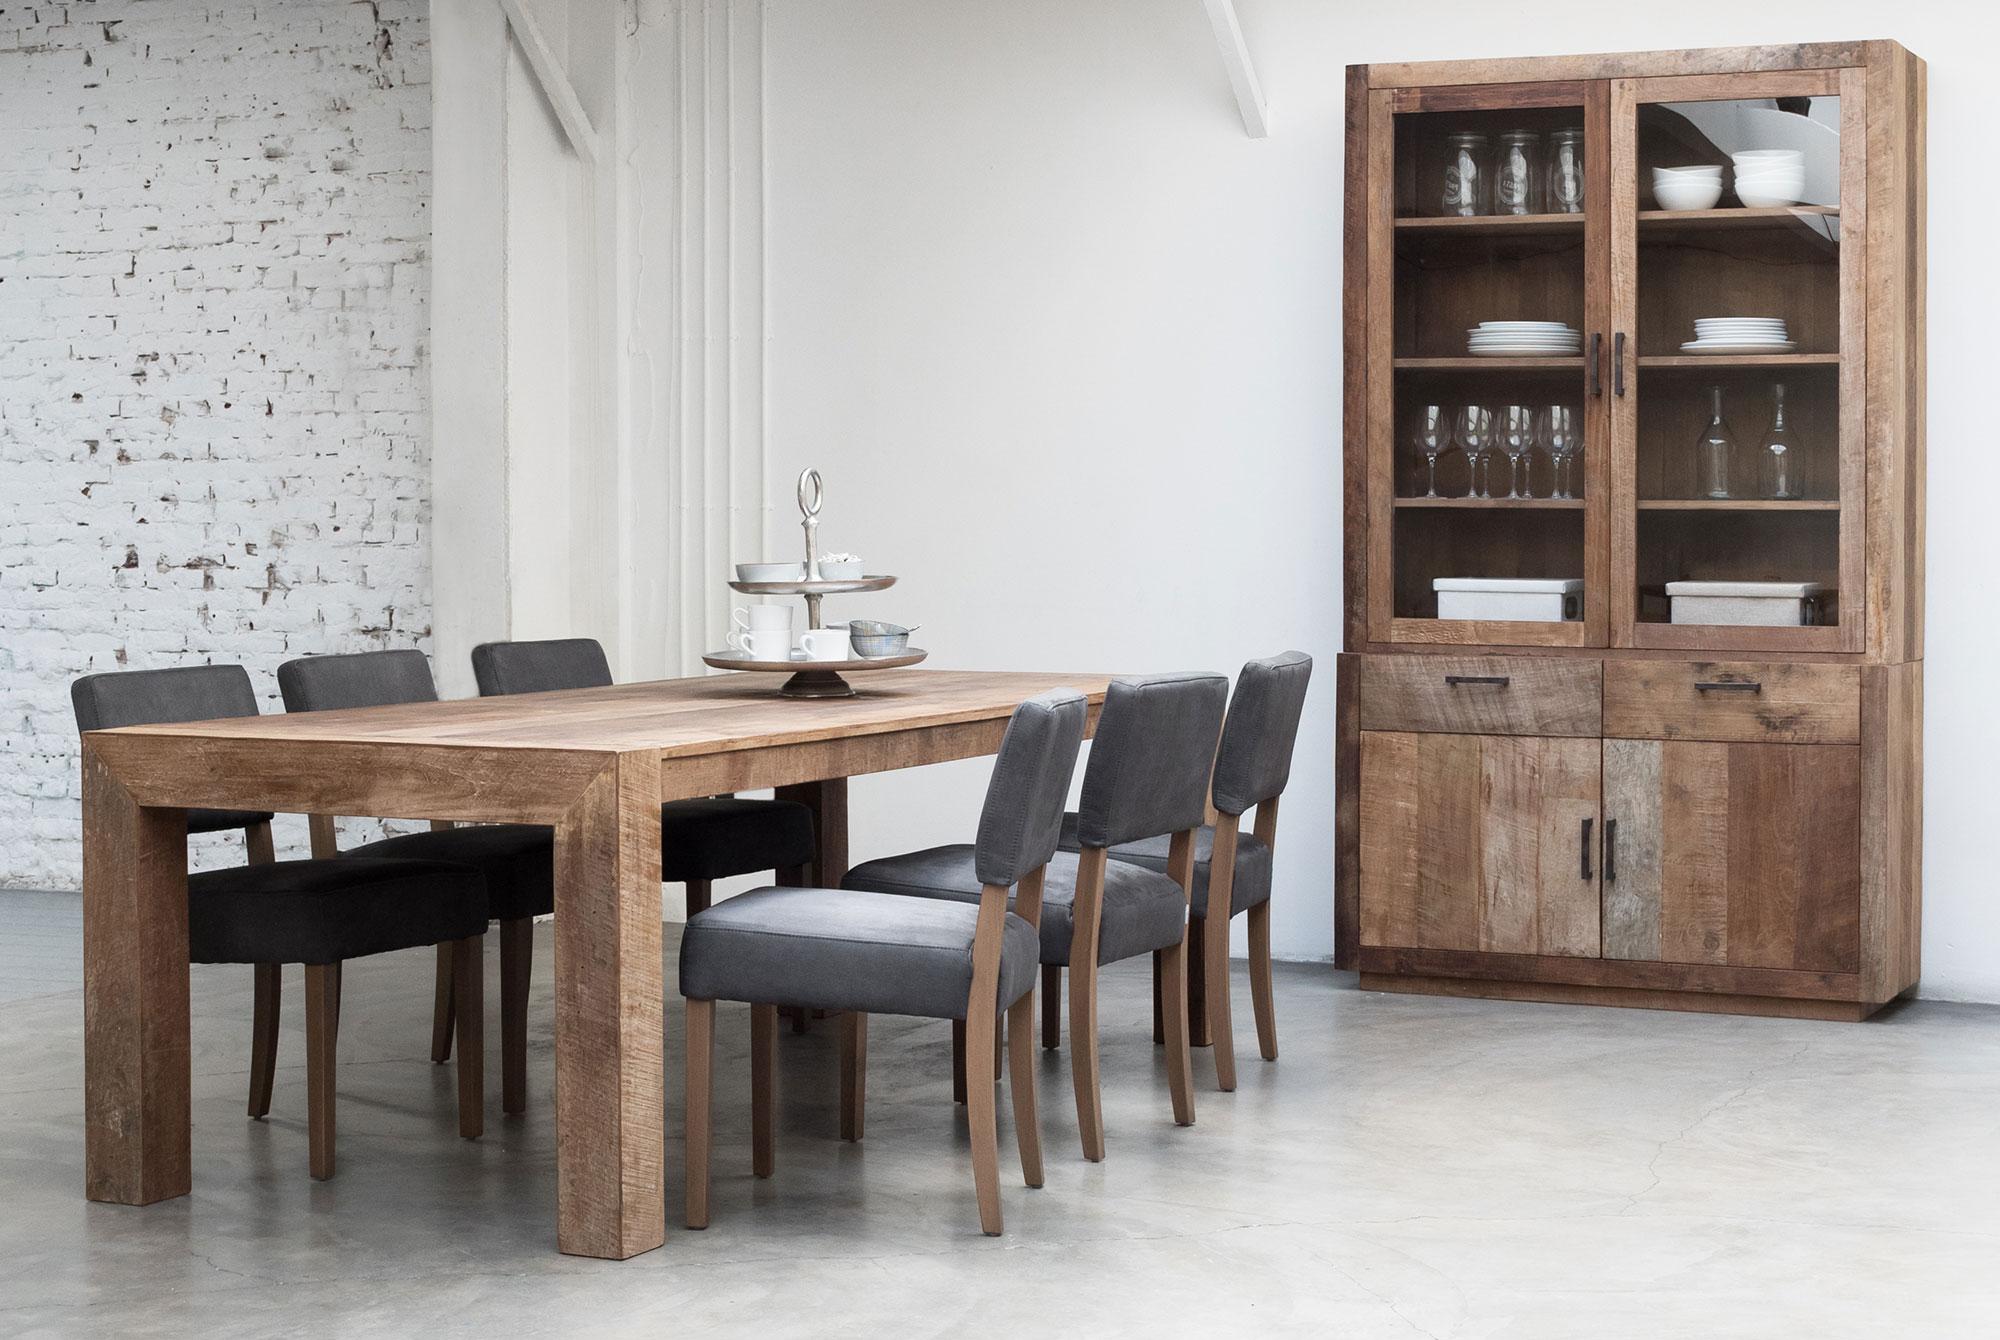 Eiken Tafel Schoonmaken : Eiken tafel poetsen how to clean a wood kitchen table hgtv